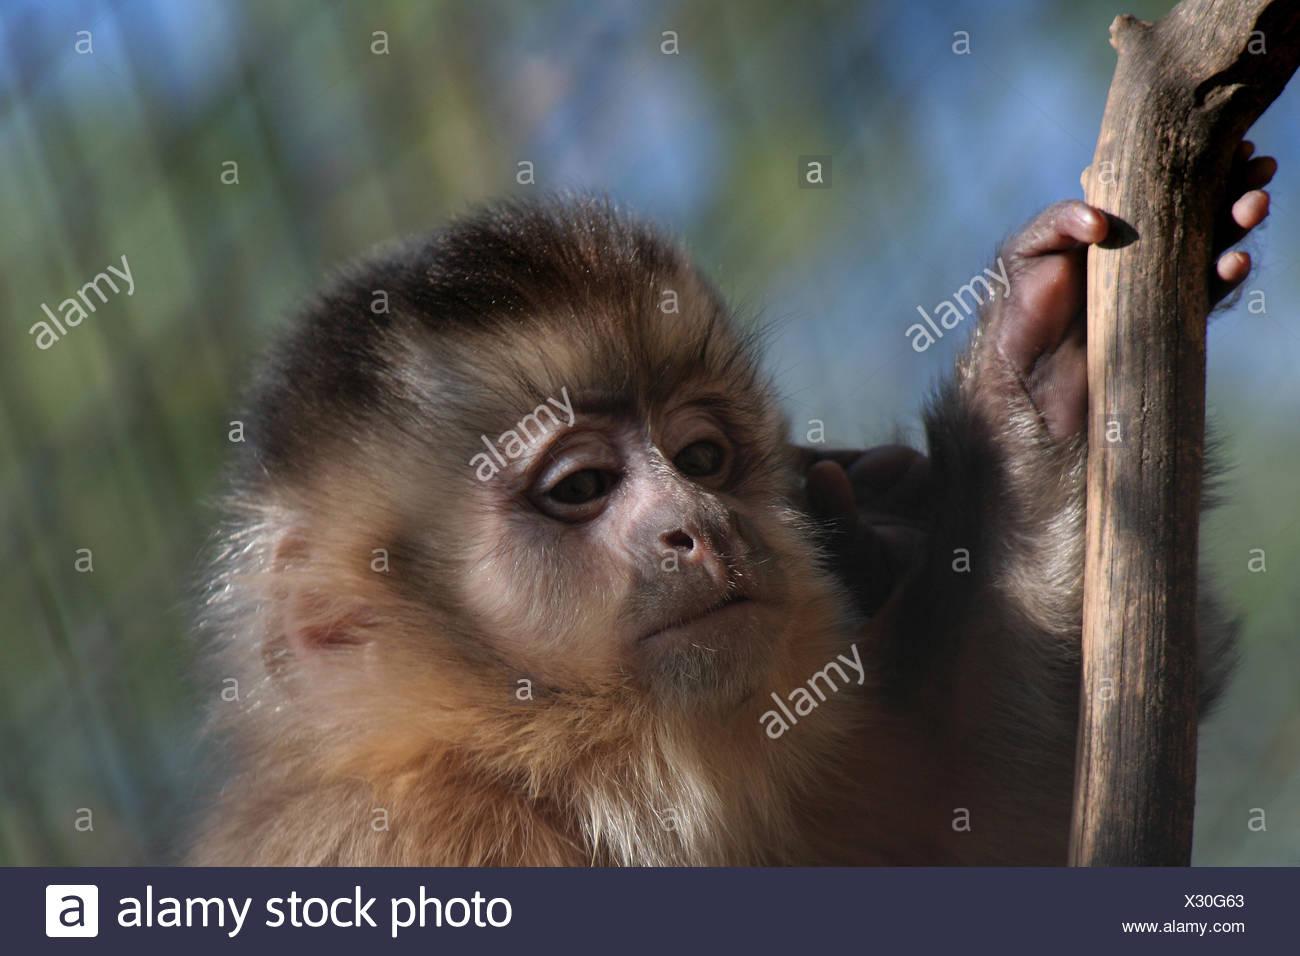 shine shines bright lucent light serene luminous monkey skin branch fence cute - Stock Image